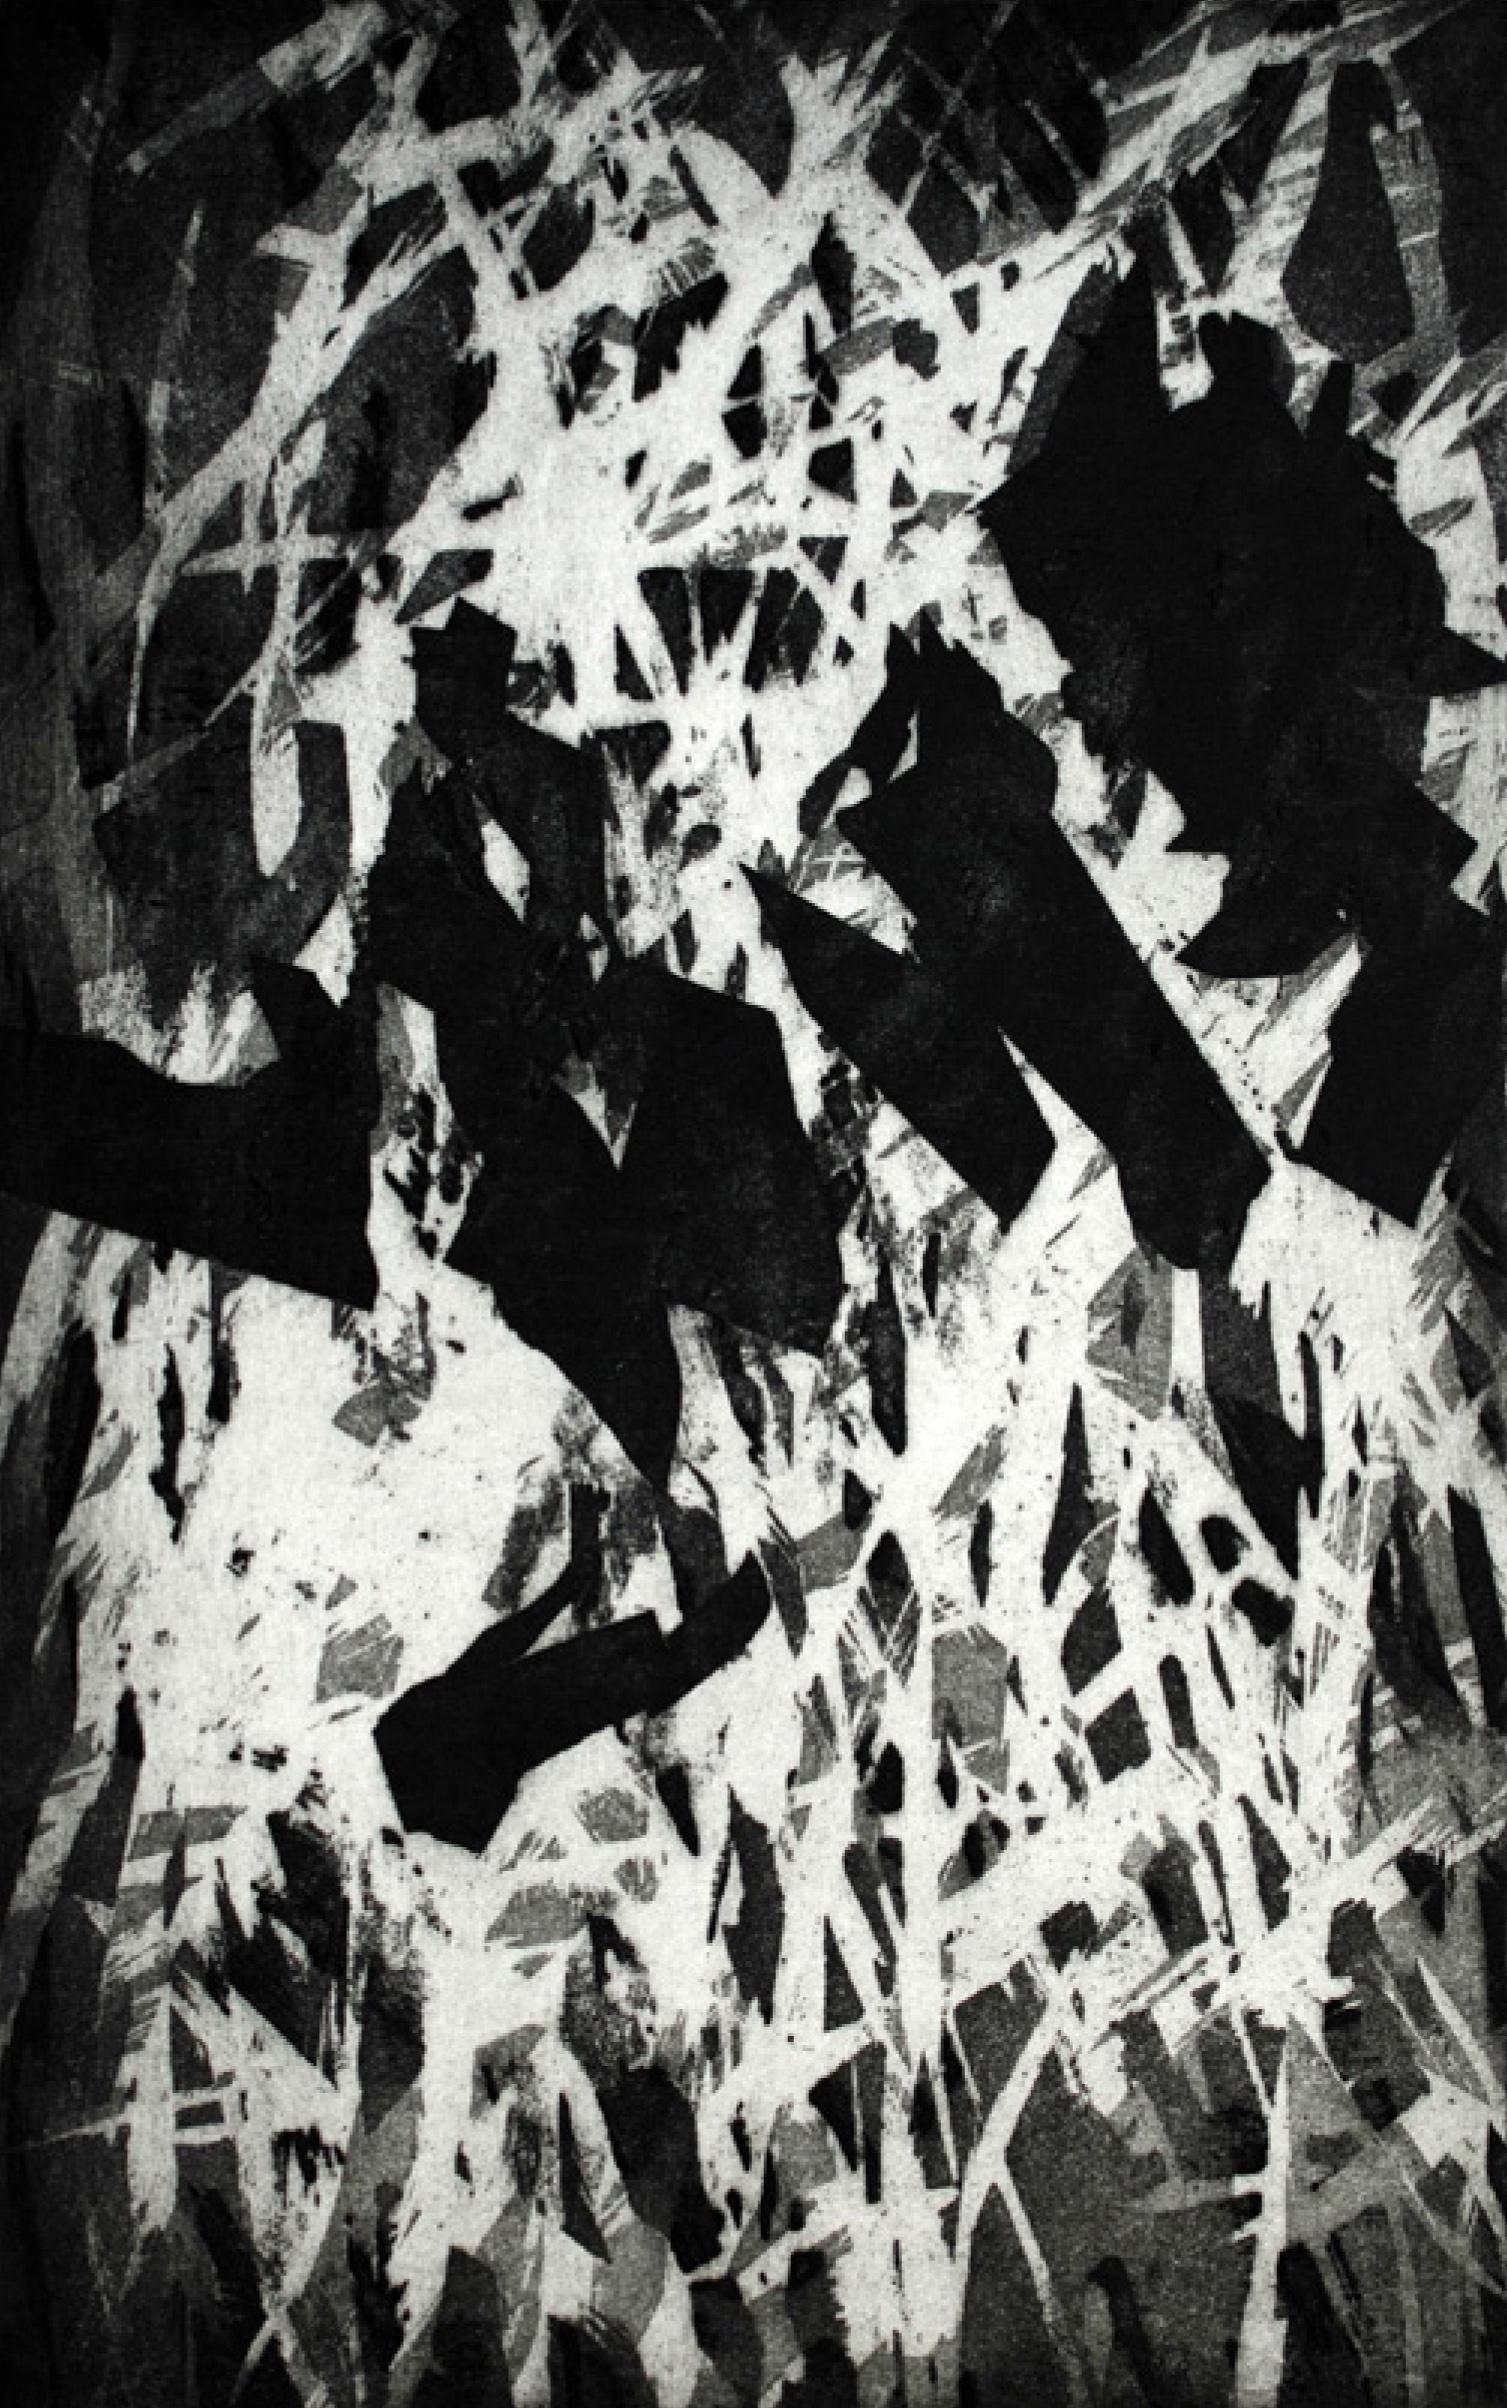 5 | Kerstin Franke-Gneuß | Doppelt | 2018 | Aquatintaradierung | 39,5 x 24,5 cm | Kunstlotterie